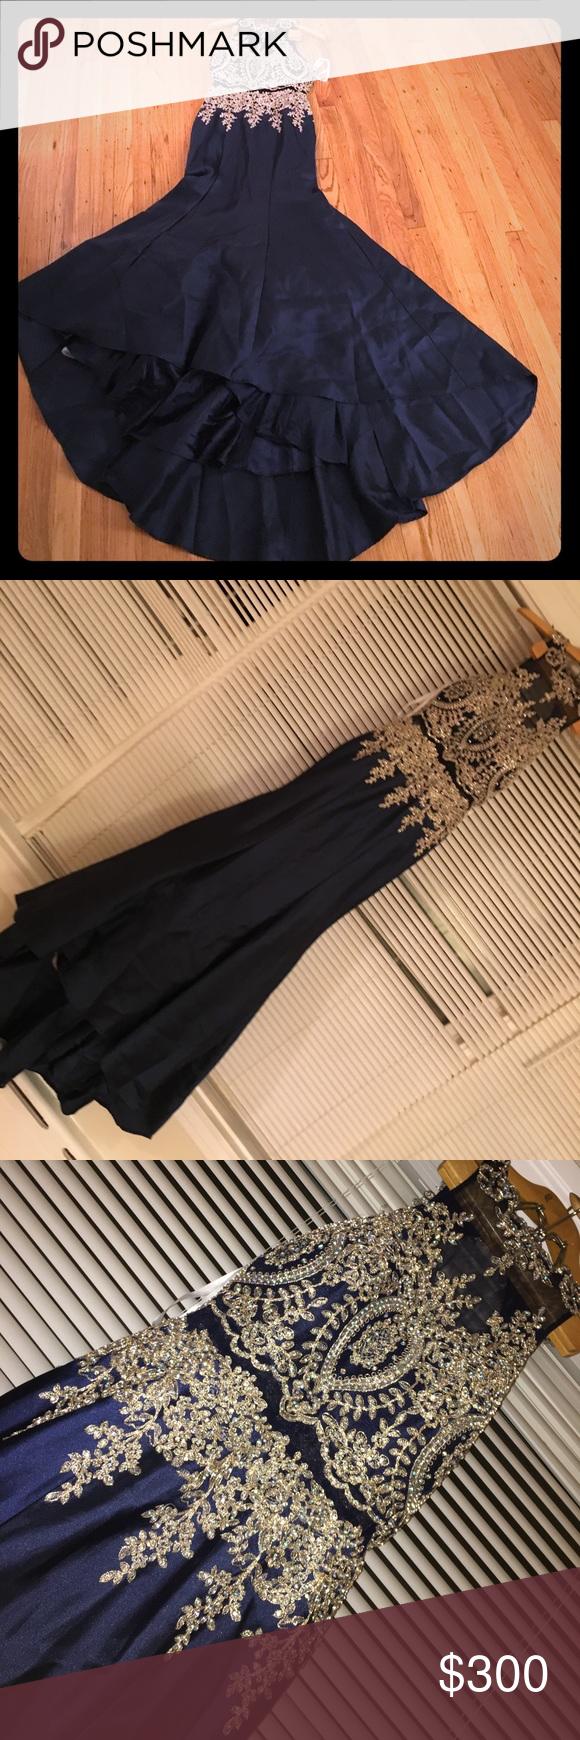 Prom dress navy blue color with golden designs navy blue color